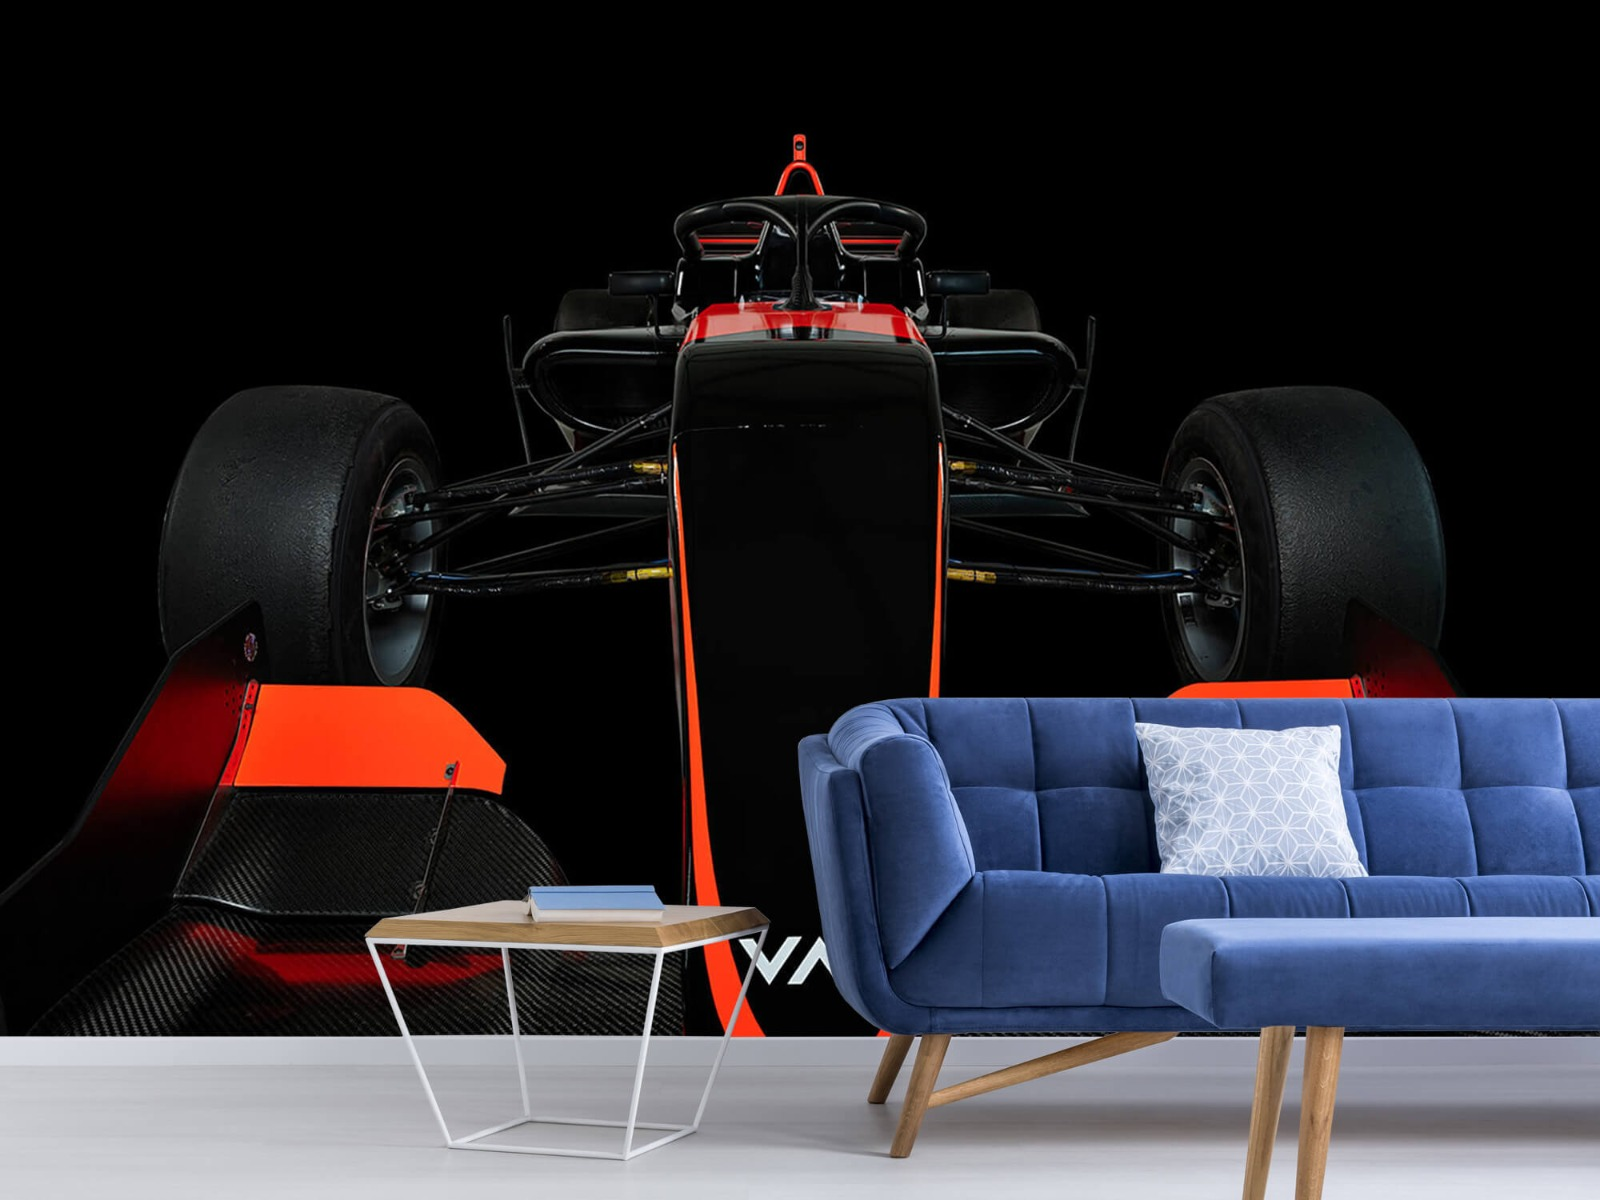 Sportauto's - Formule 3 - Lower front view - dark - Slaapkamer 5